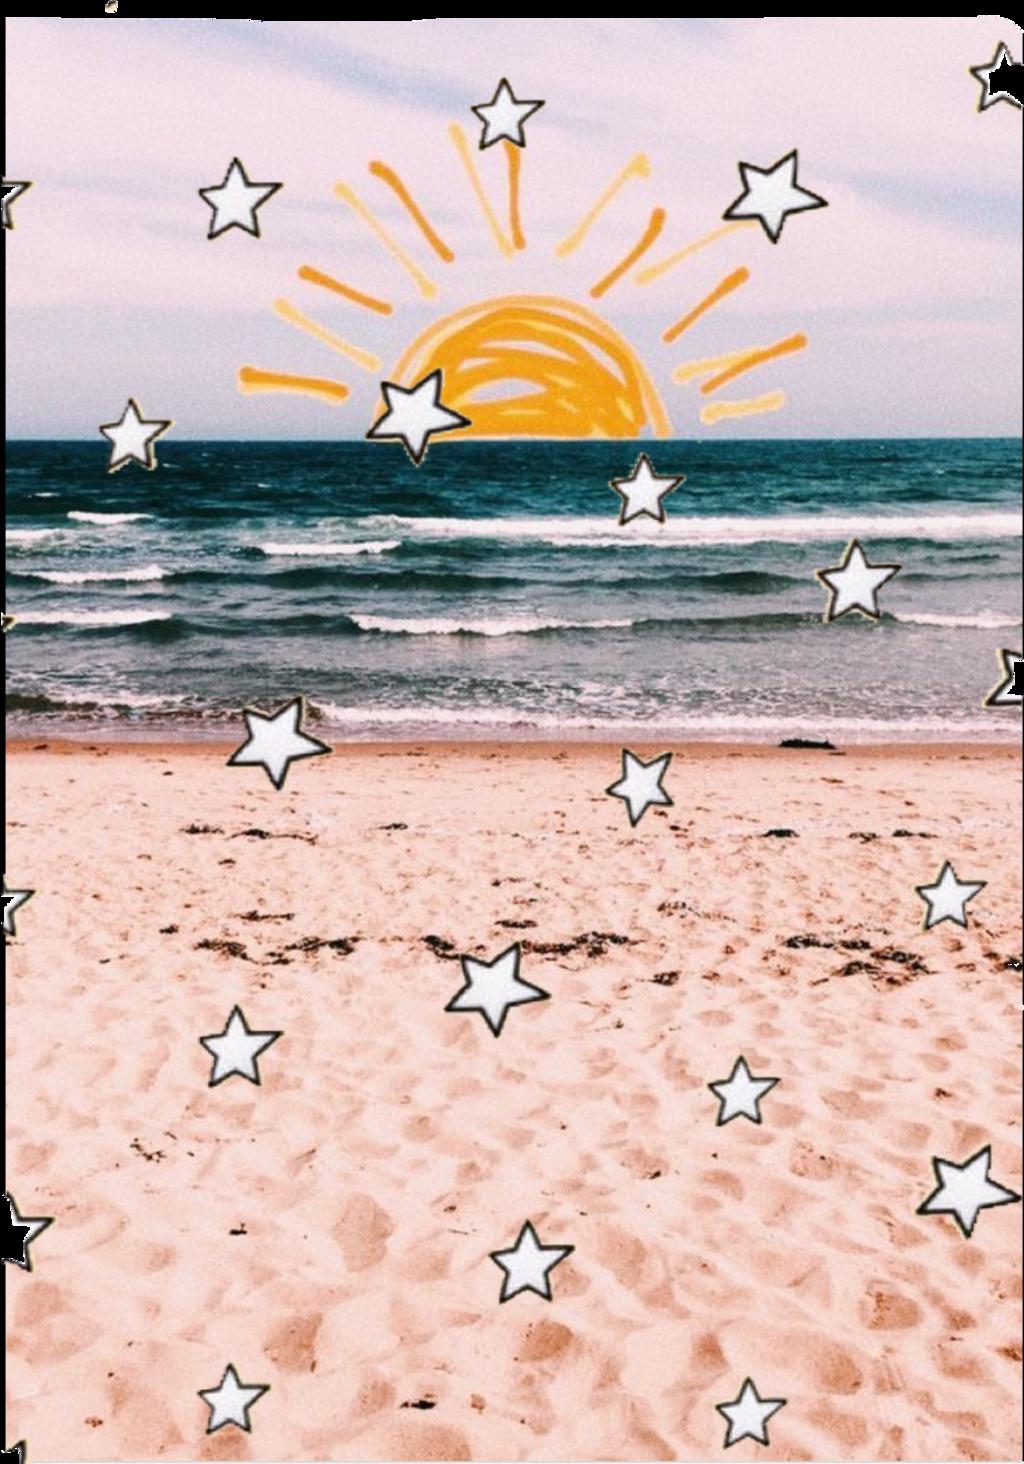 #sticker #summer #vsco #stars #sunshine #sun #sea #beach #waves